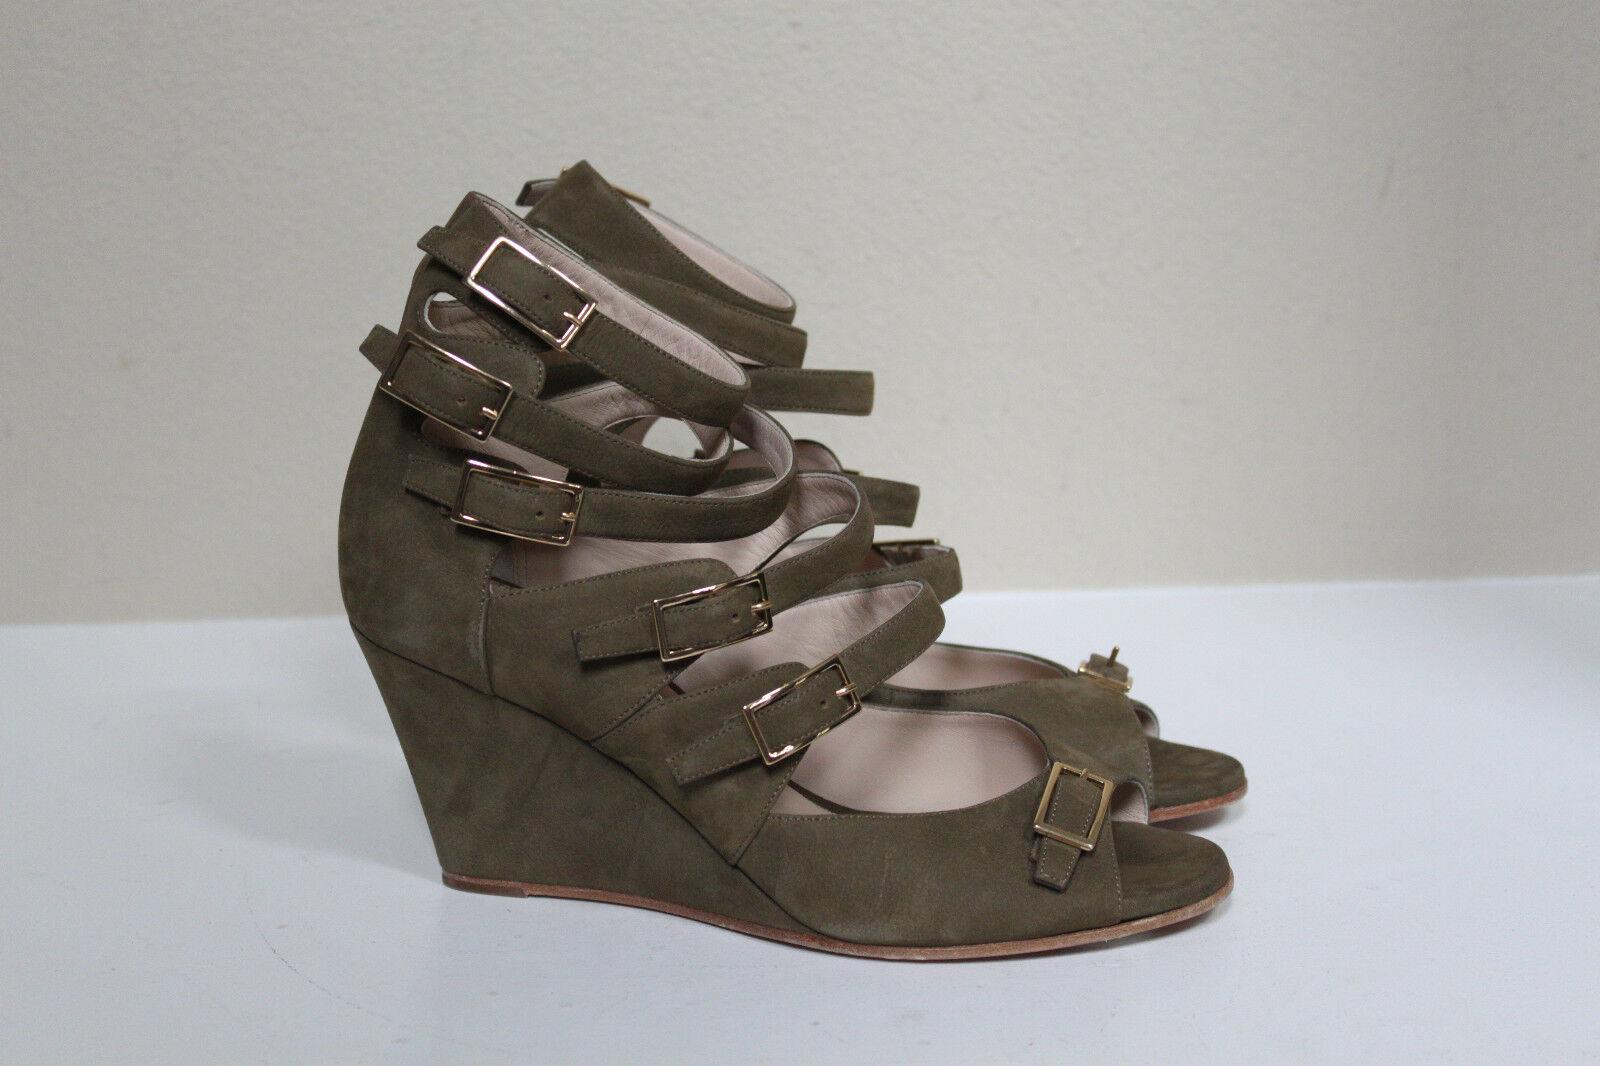 Nuova sz 9   39.5 Chloe verde Suede Multi  brep Open Toe Wedge Heel Sandal scarpe  promozioni di sconto